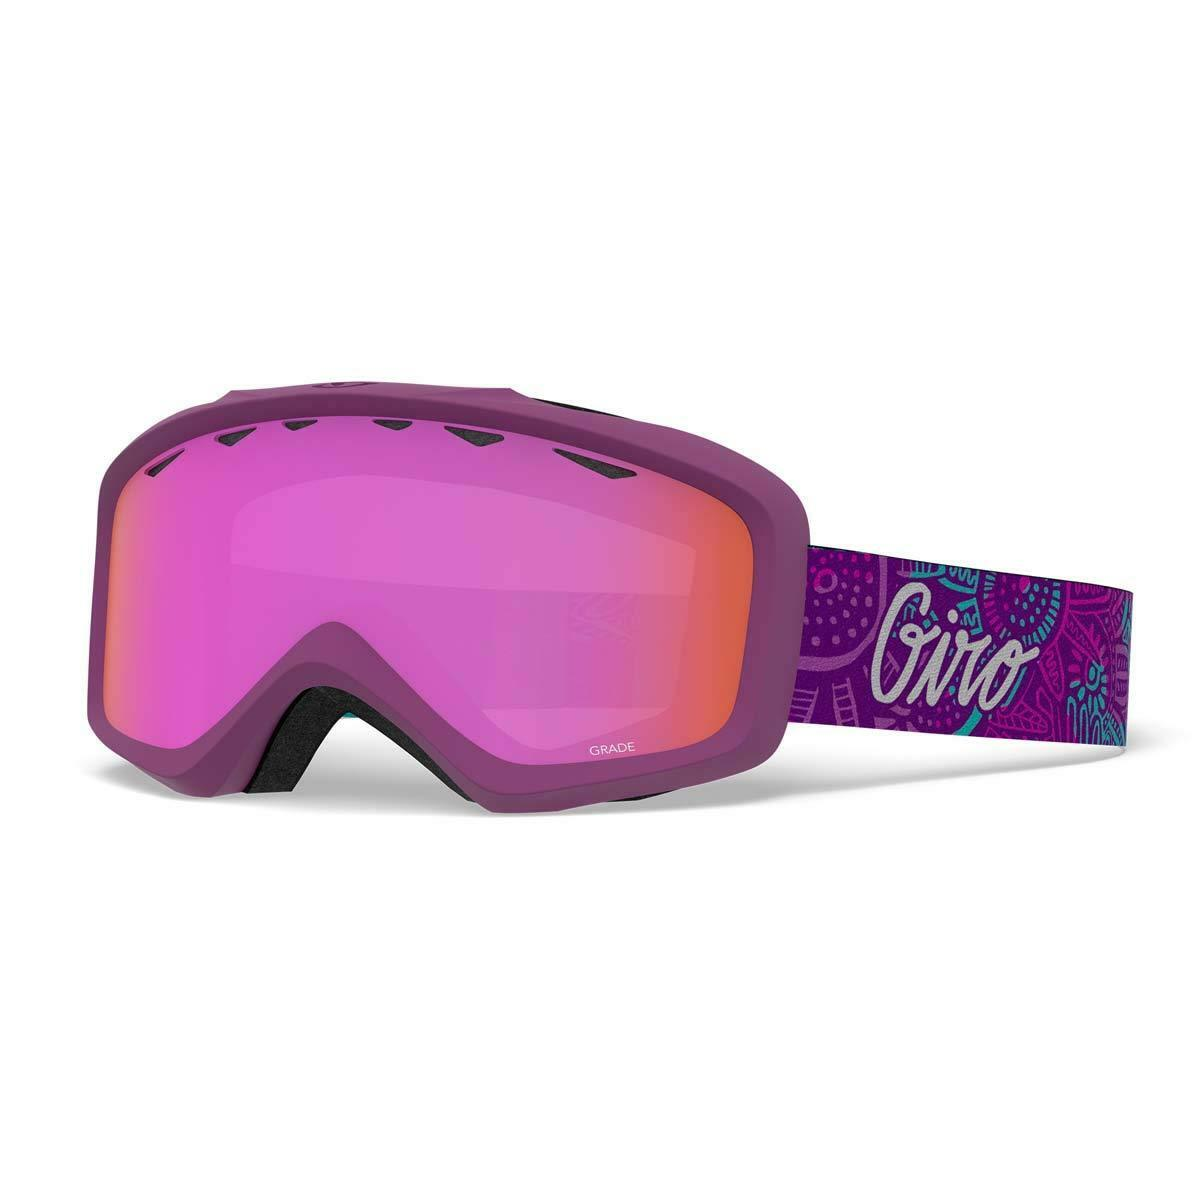 Giro 2019 Grade  Kids Snow Goggles Psych Blossom - Amber Pink 7094647  enjoy 50% off